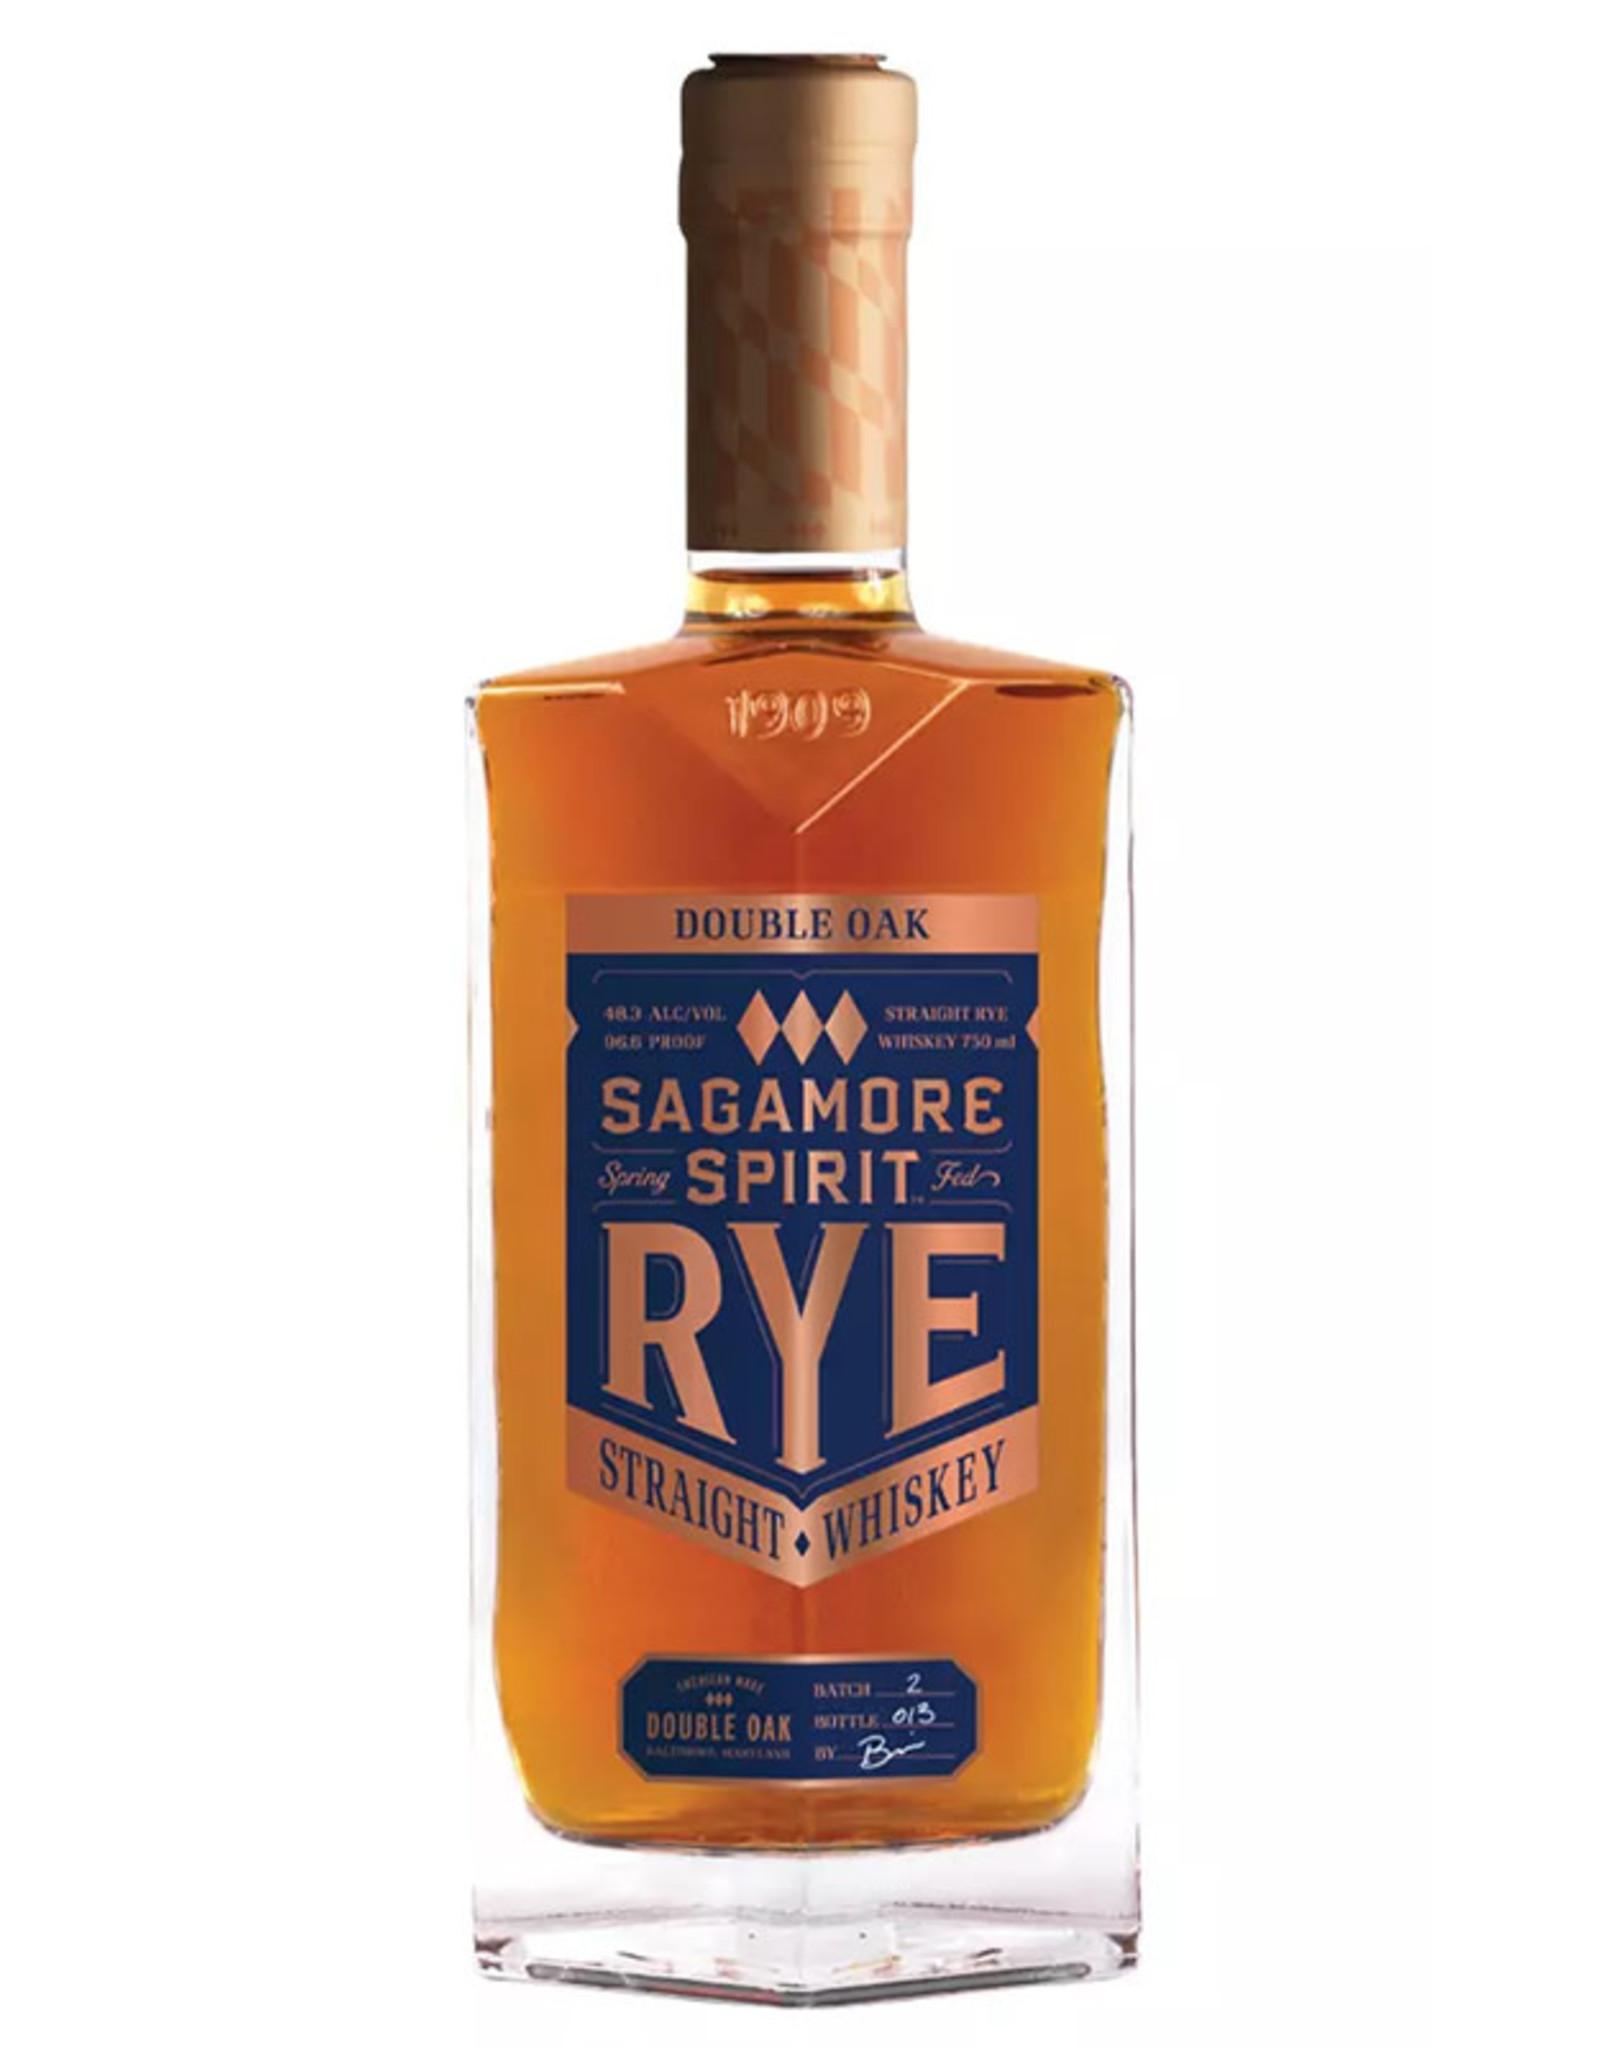 USA Sagamore Spirit Double Oak Rye